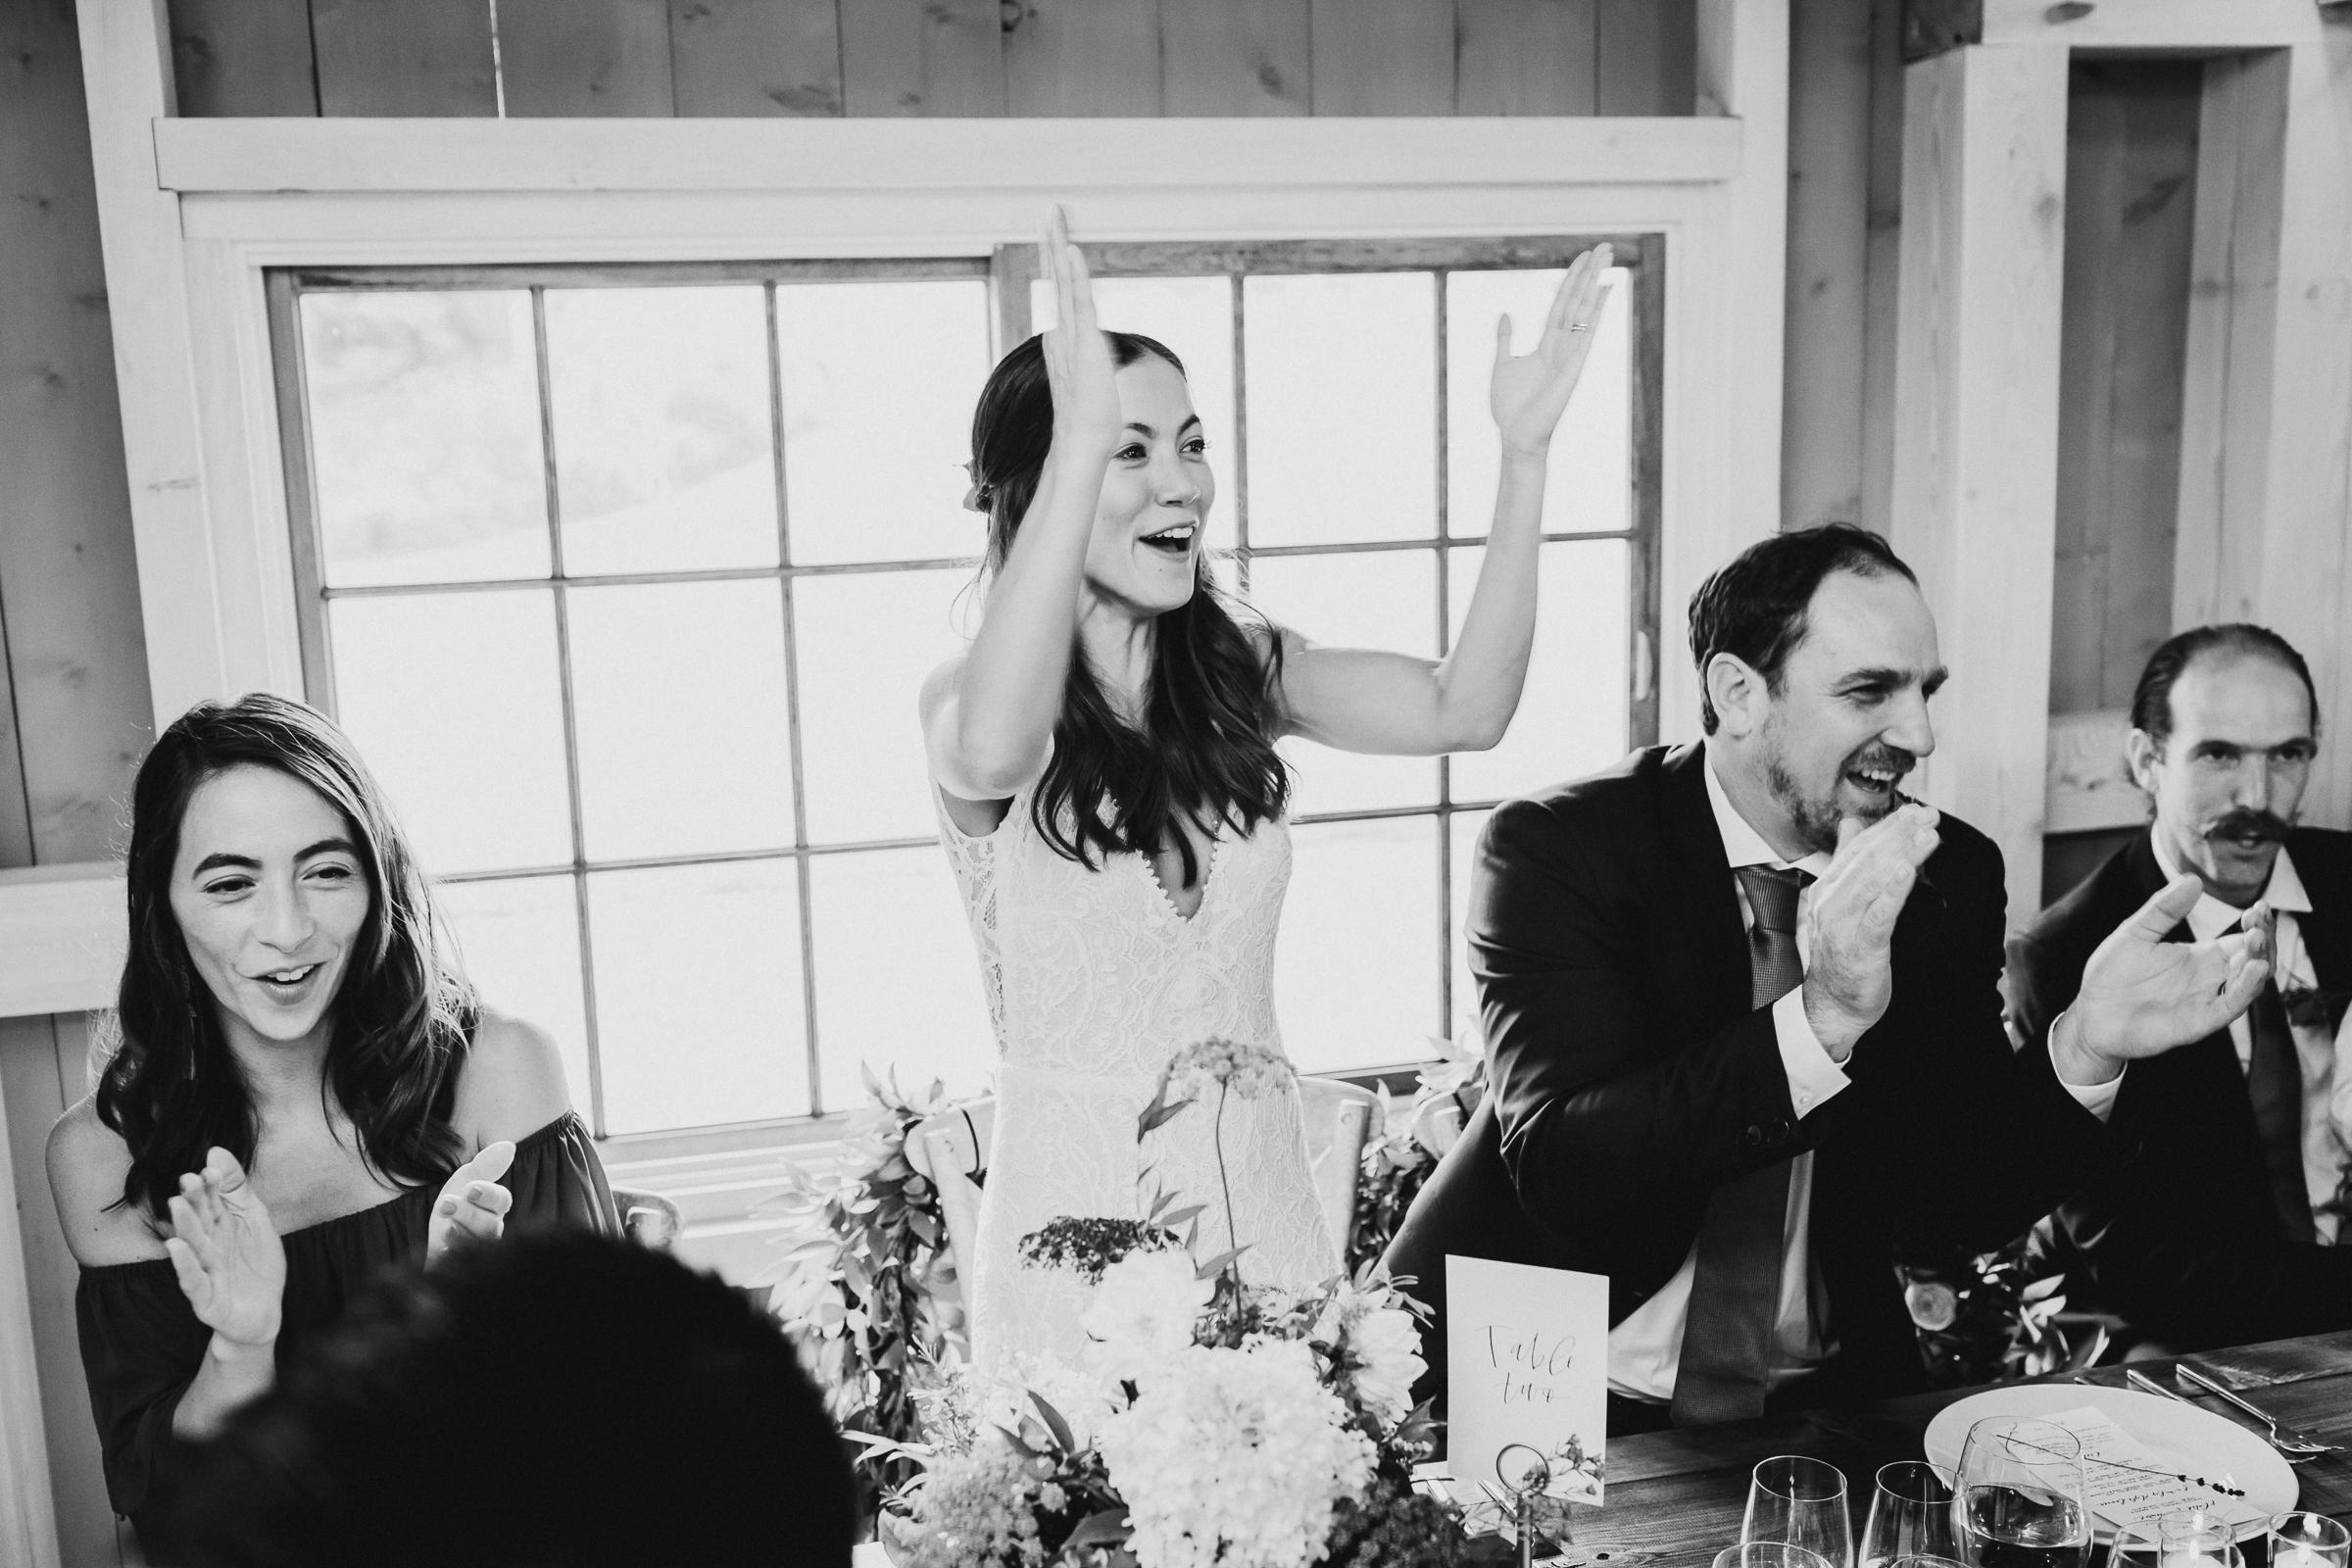 Marianmade-Farm-Wiscasset-Maine-Fine-Art-Documentary-Wedding-Photographer-Elvira-Kalviste-Photography-116.jpg